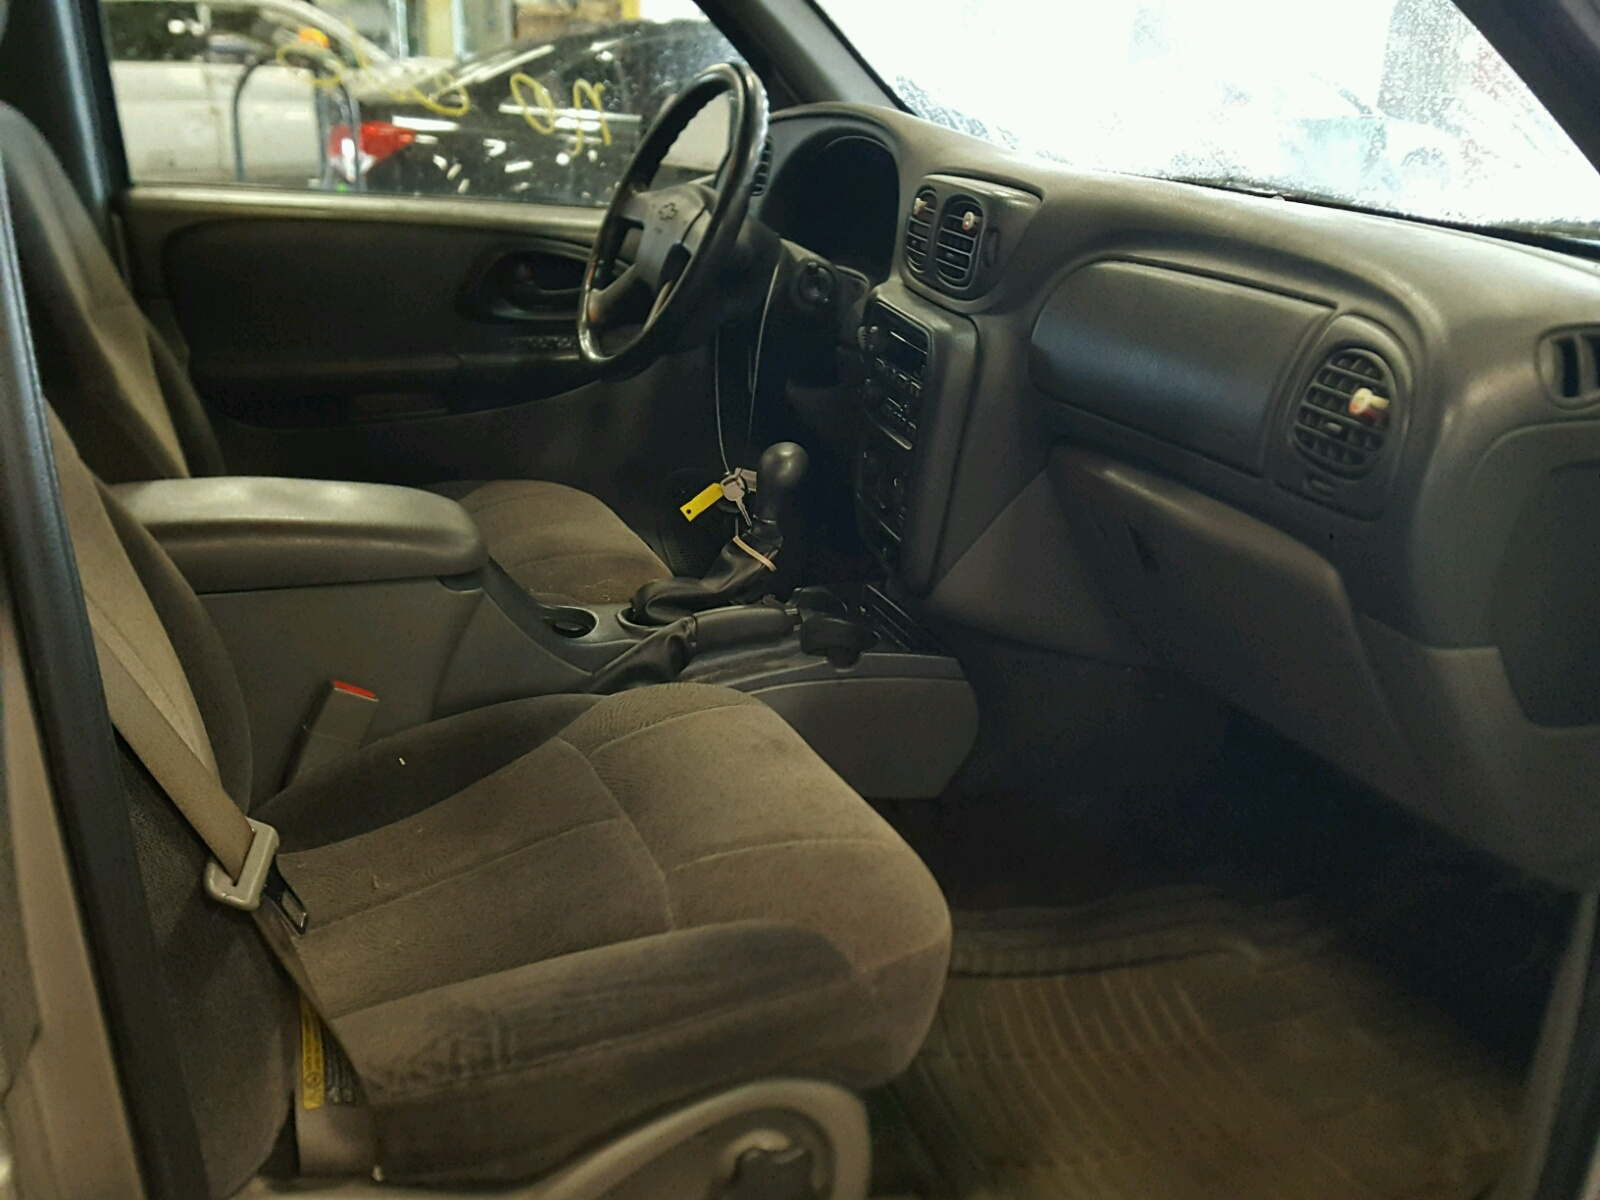 2002 Chevrolet Trailblazer for sale at Copart Fridley MN Lot